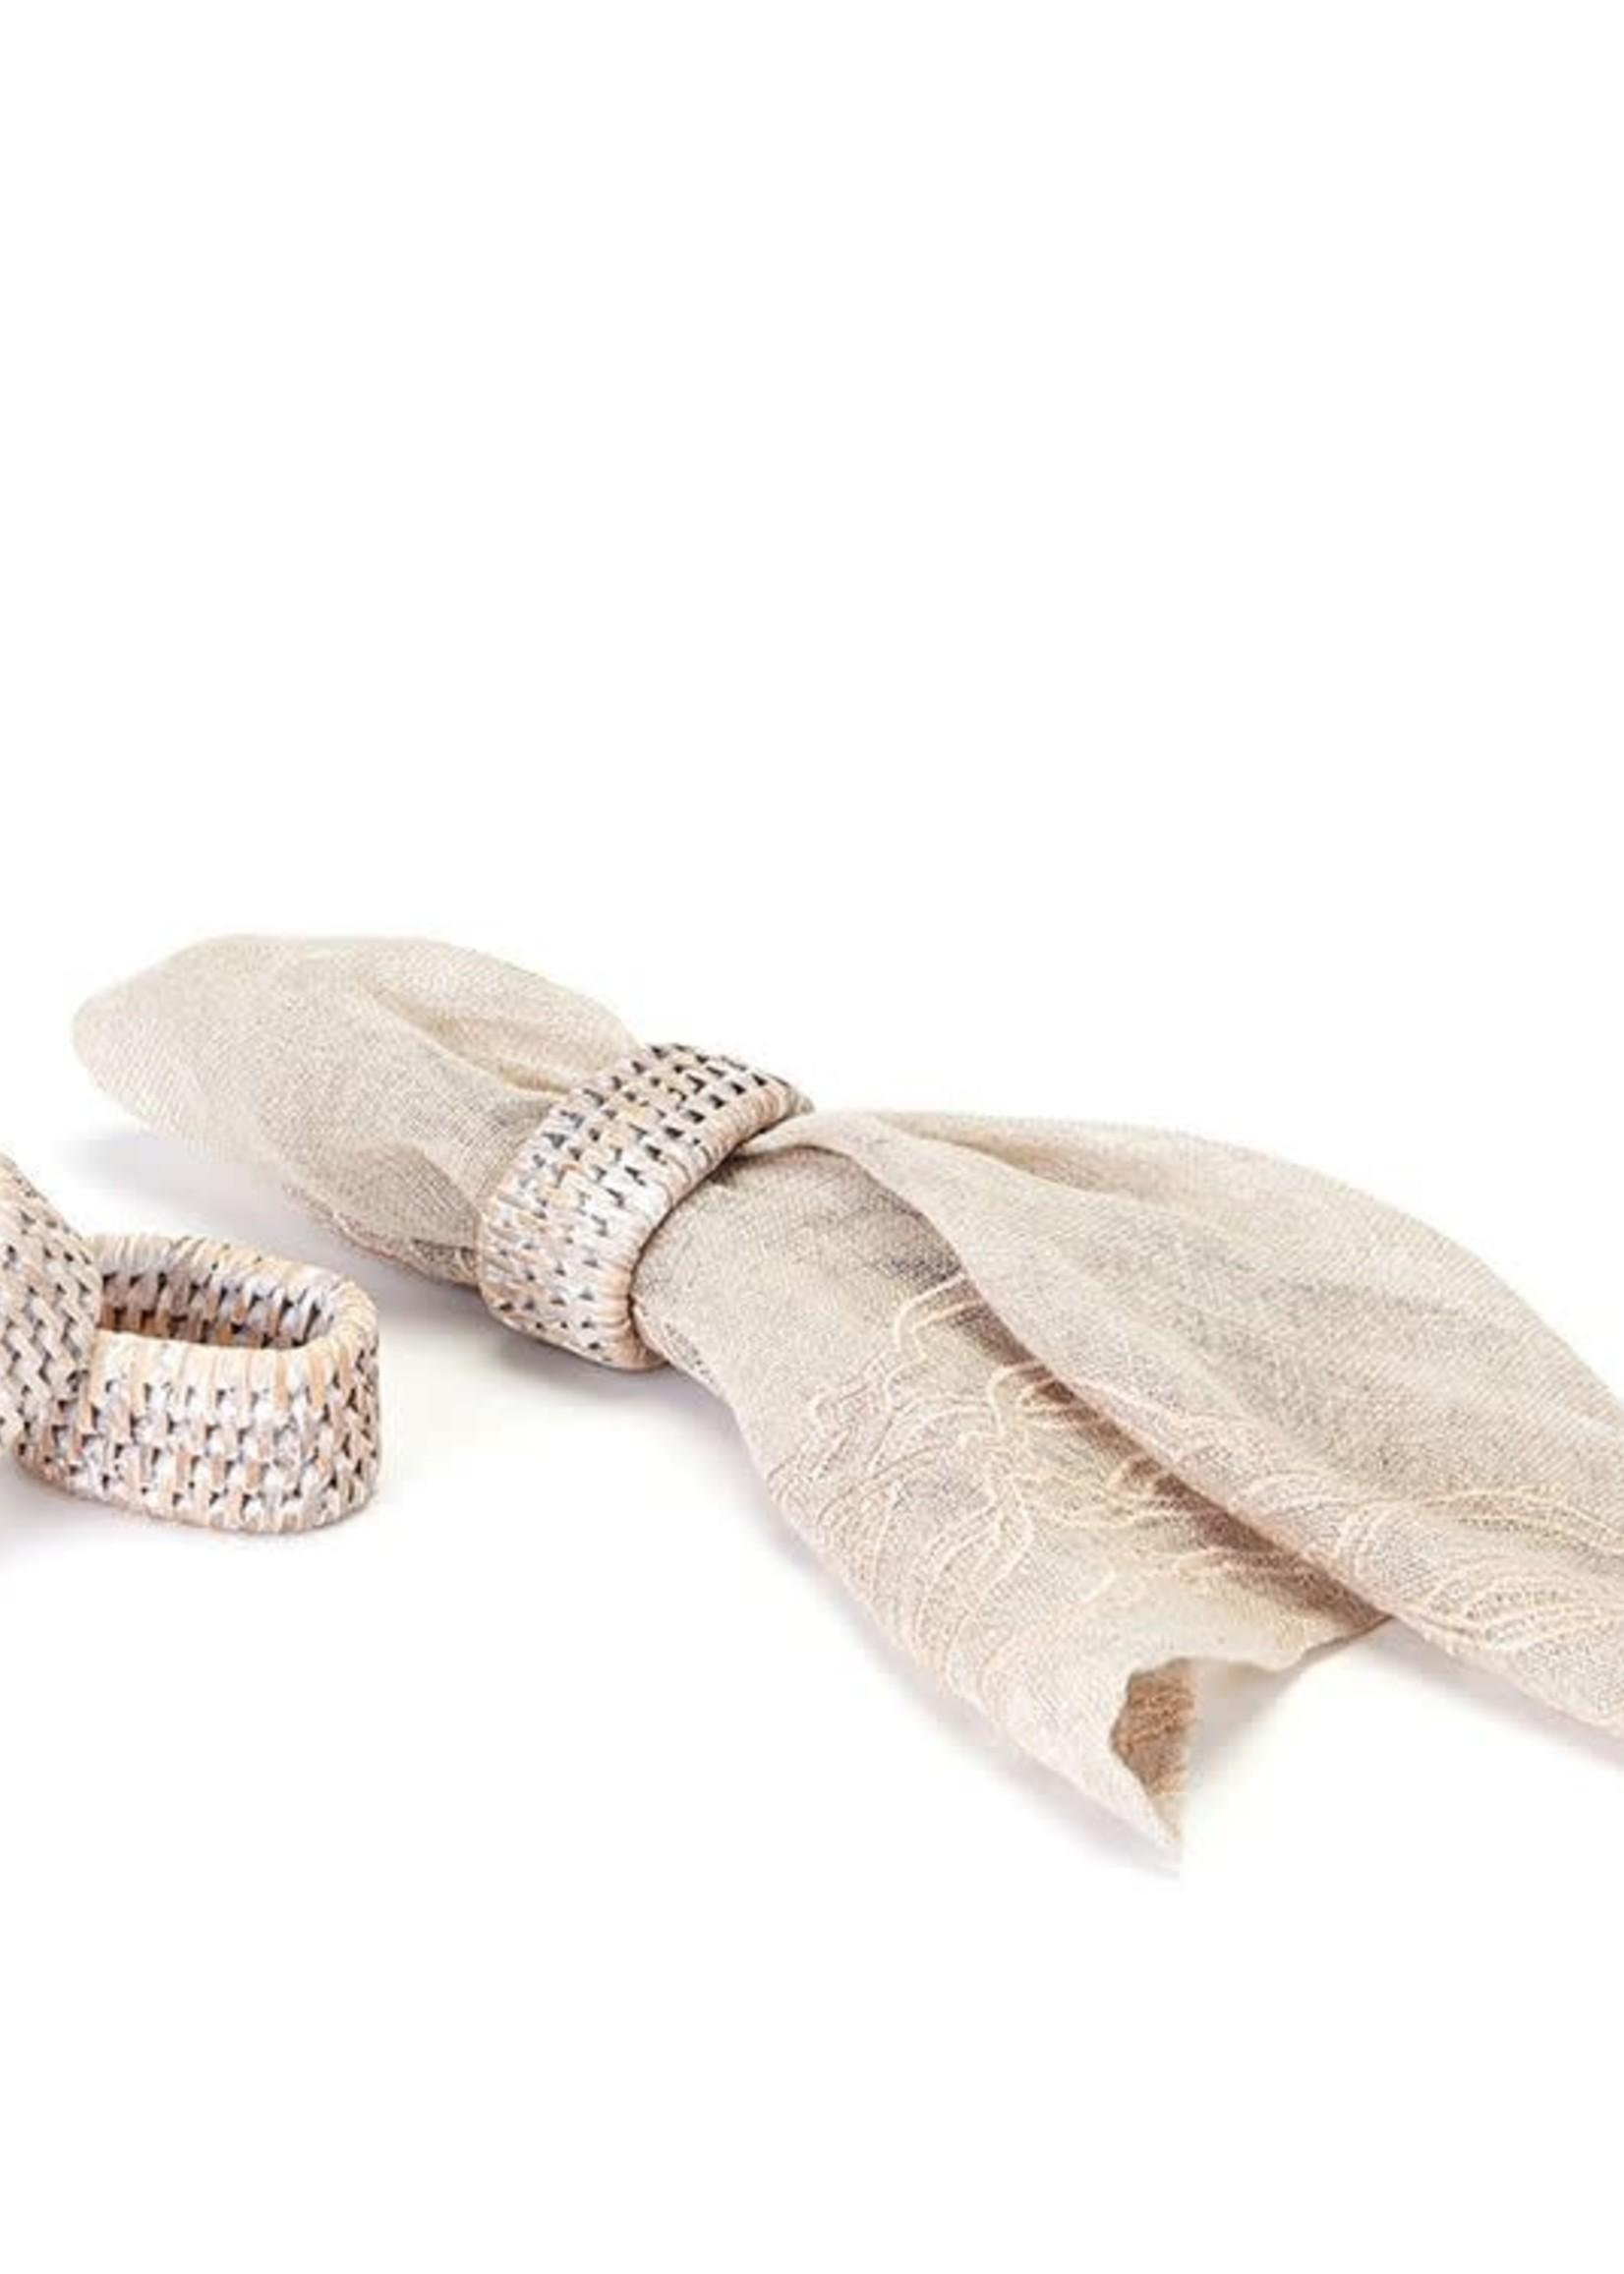 Burma Rattan Napkin Ring